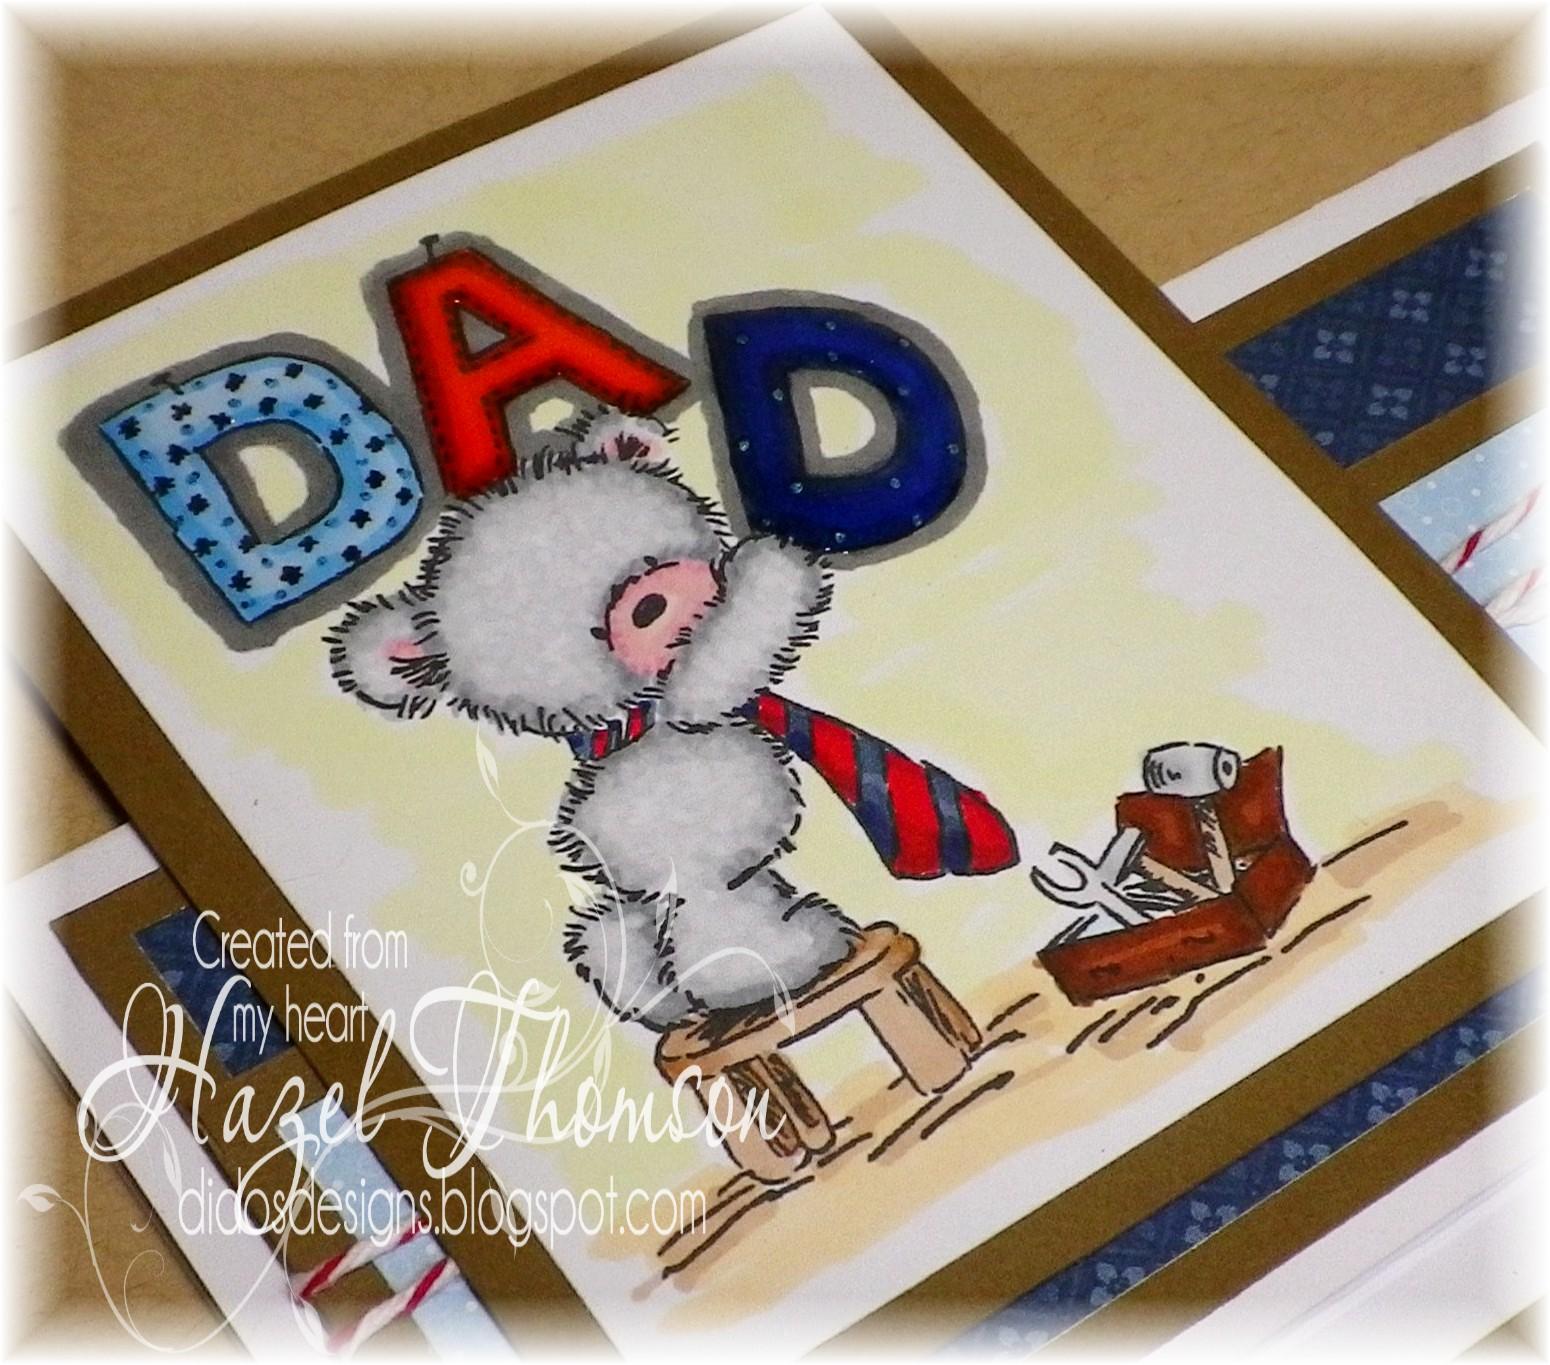 http://2.bp.blogspot.com/-SaiySyWfWbY/T9t2SQkIFuI/AAAAAAAAHWU/isylice9RM8/s1600/Cards+By+Dido\'s+Designs+006.JPG